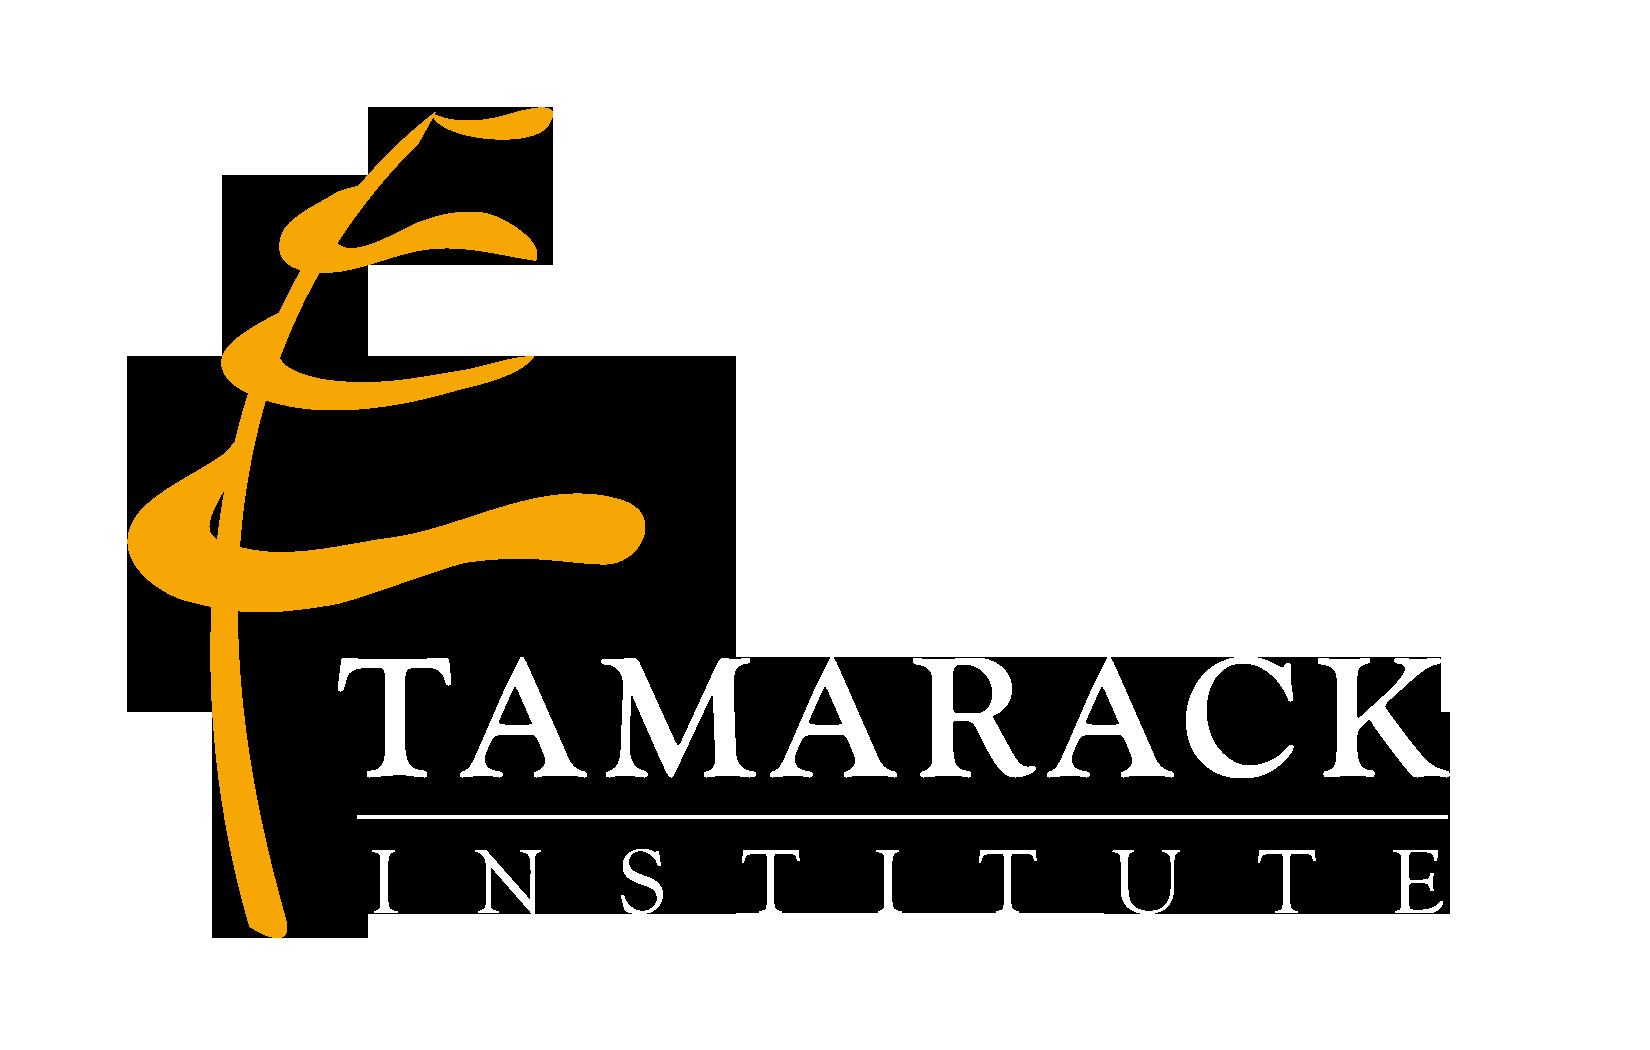 Tamarack-logo_white_text.png